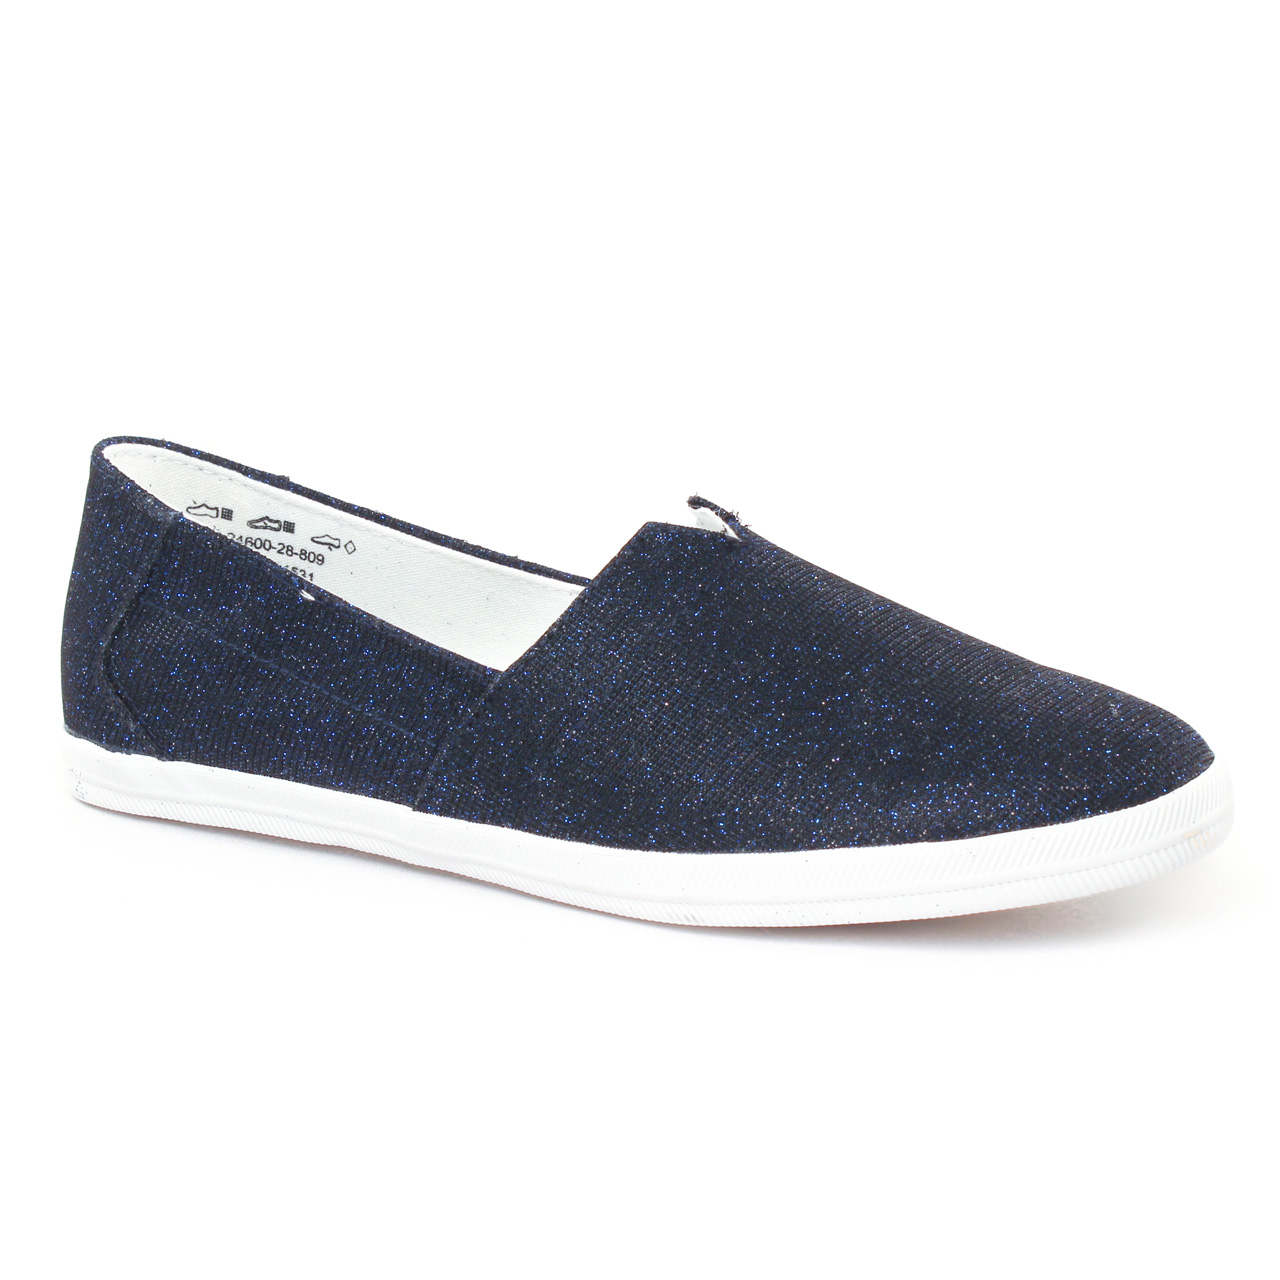 tamaris 24600 night mocassin slippers bleu marine printemps t chez trois par 3. Black Bedroom Furniture Sets. Home Design Ideas